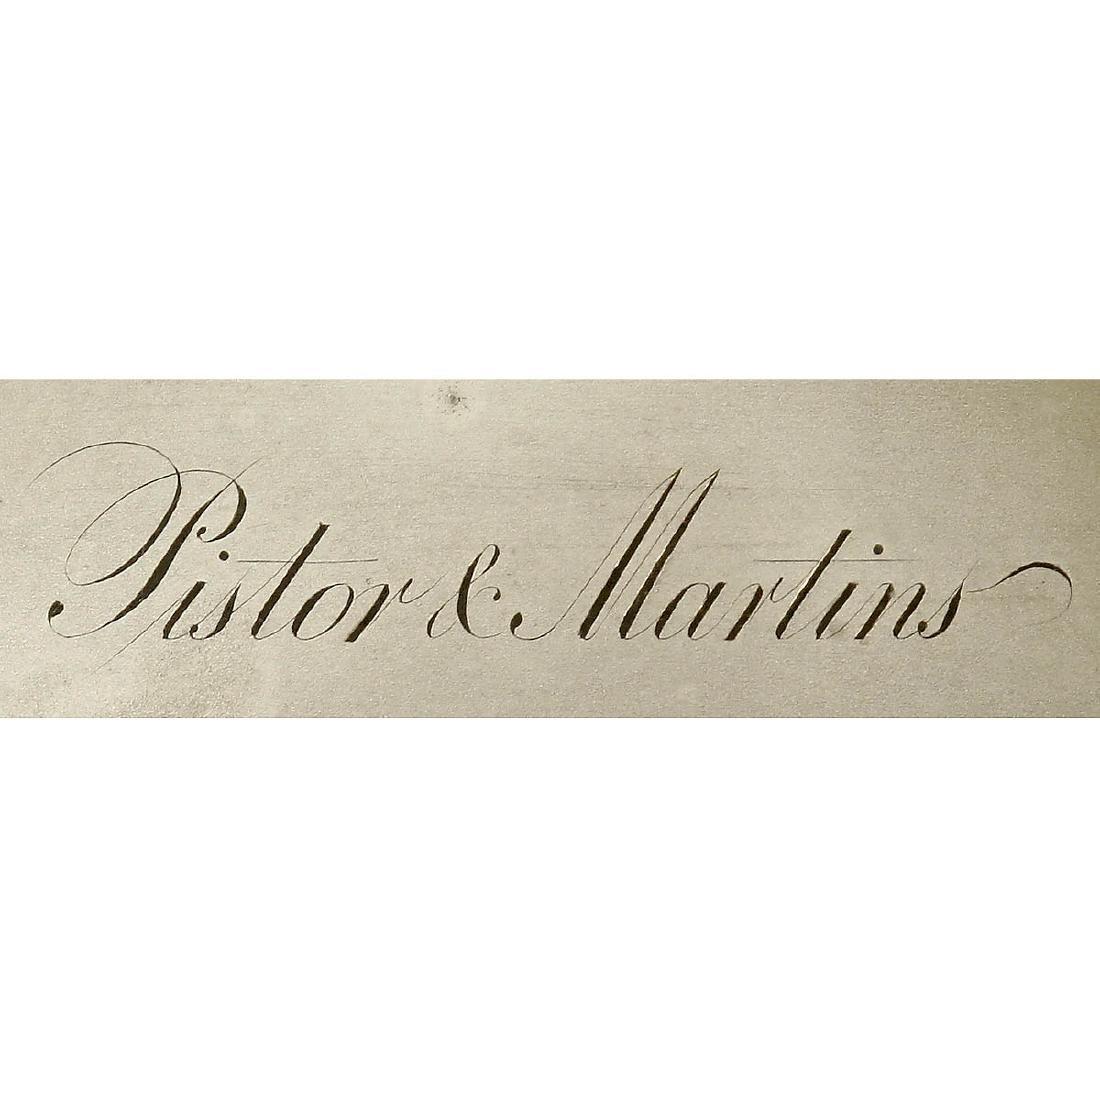 German Transit Theodolite by Pistor & Martins, c. 1850 - 2